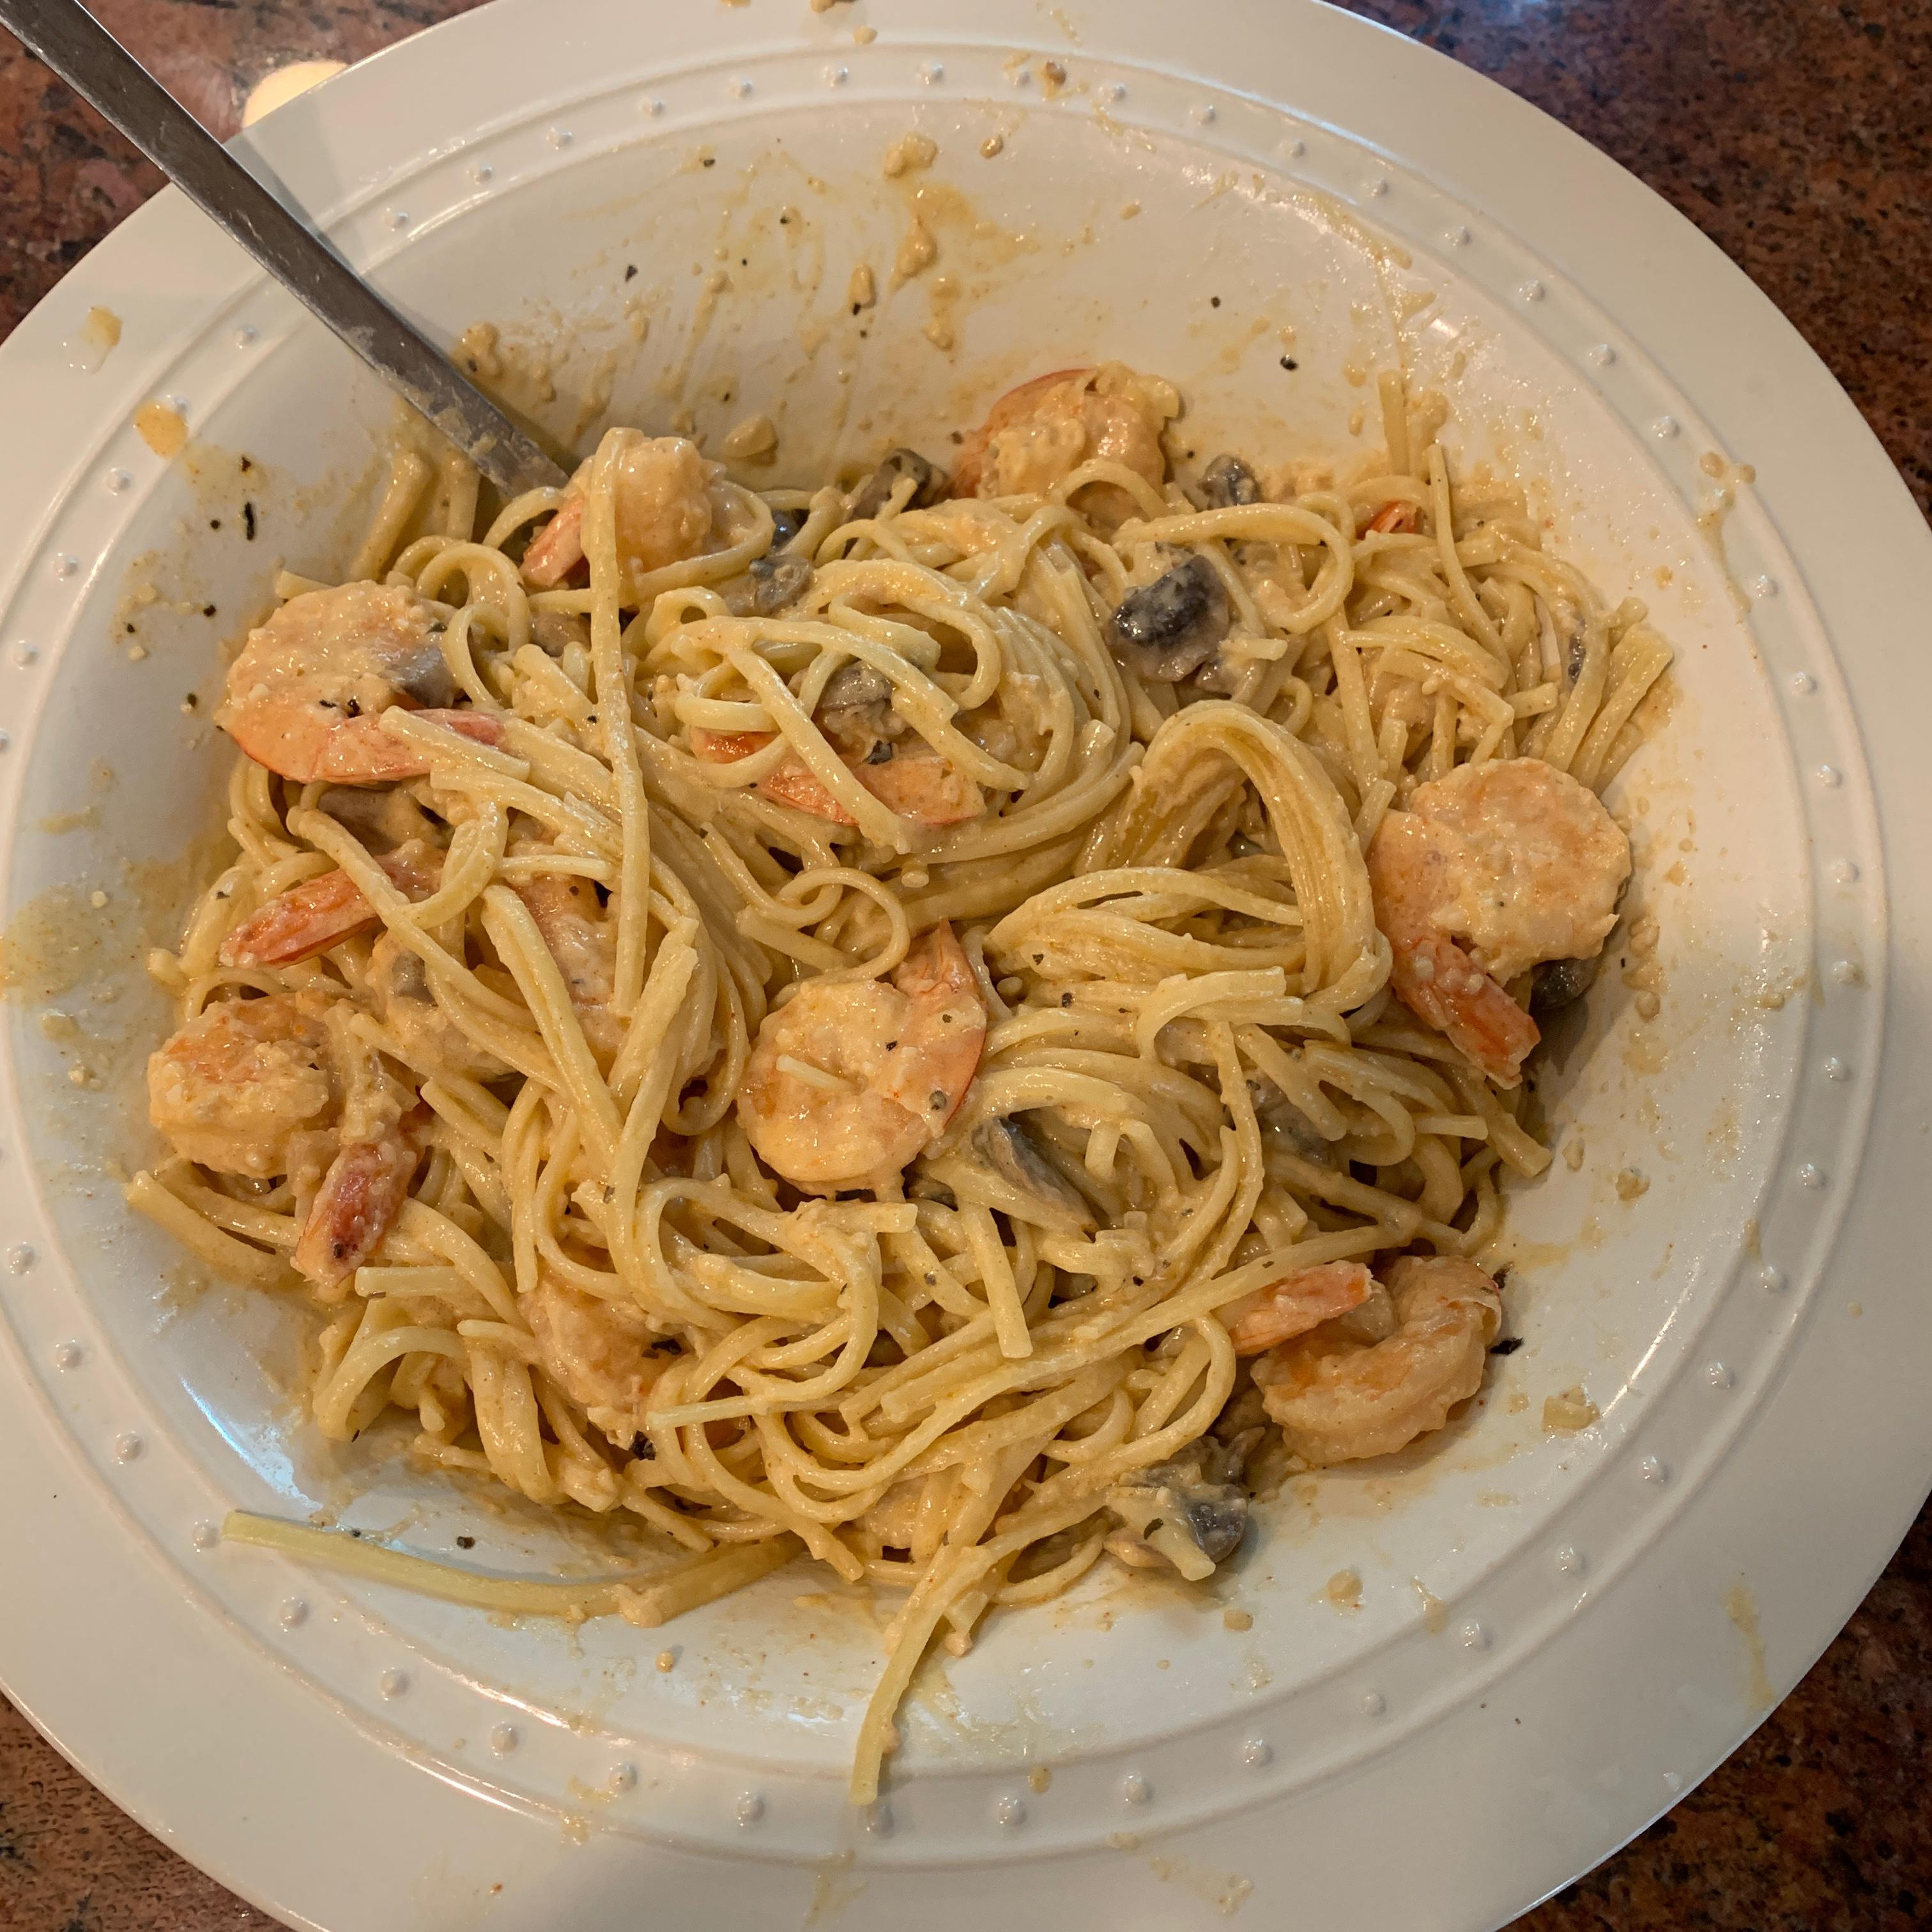 Creamy Shrimp Pasta with Mushrooms JenniPiaz